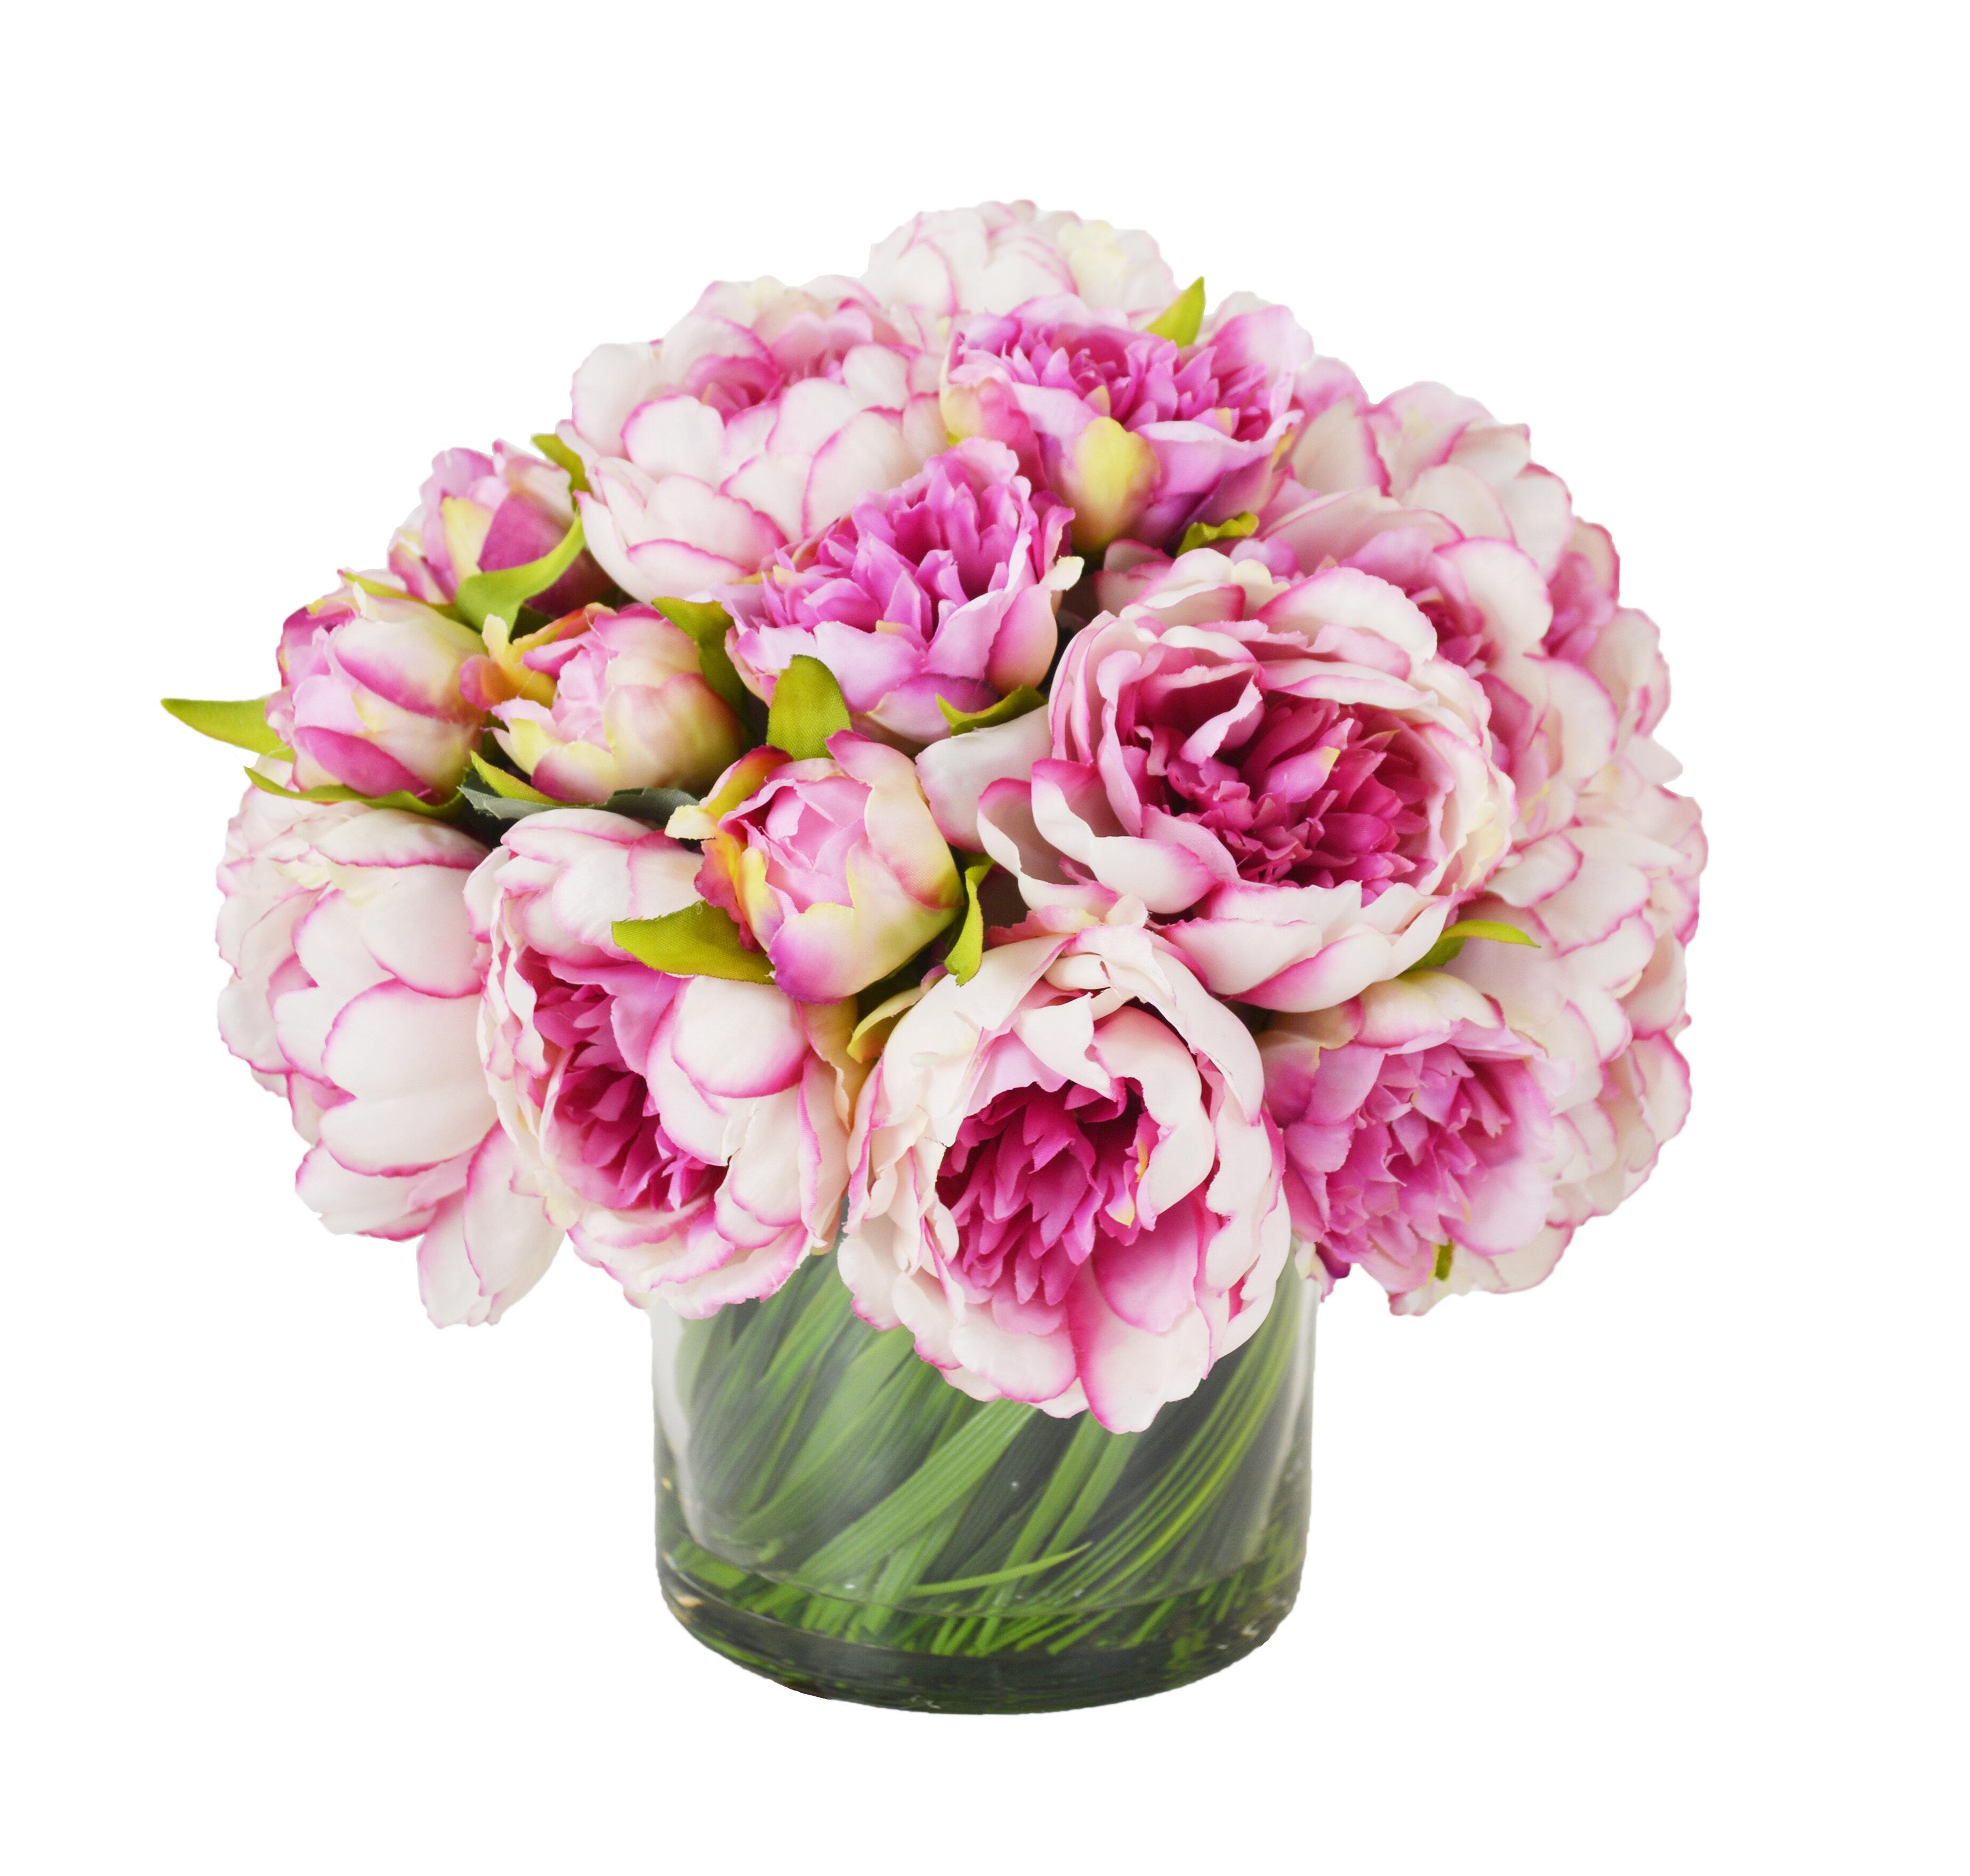 Creative Displays Inc Faux Peonies Floral Arrangement In Glass Vase Reviews Perigold